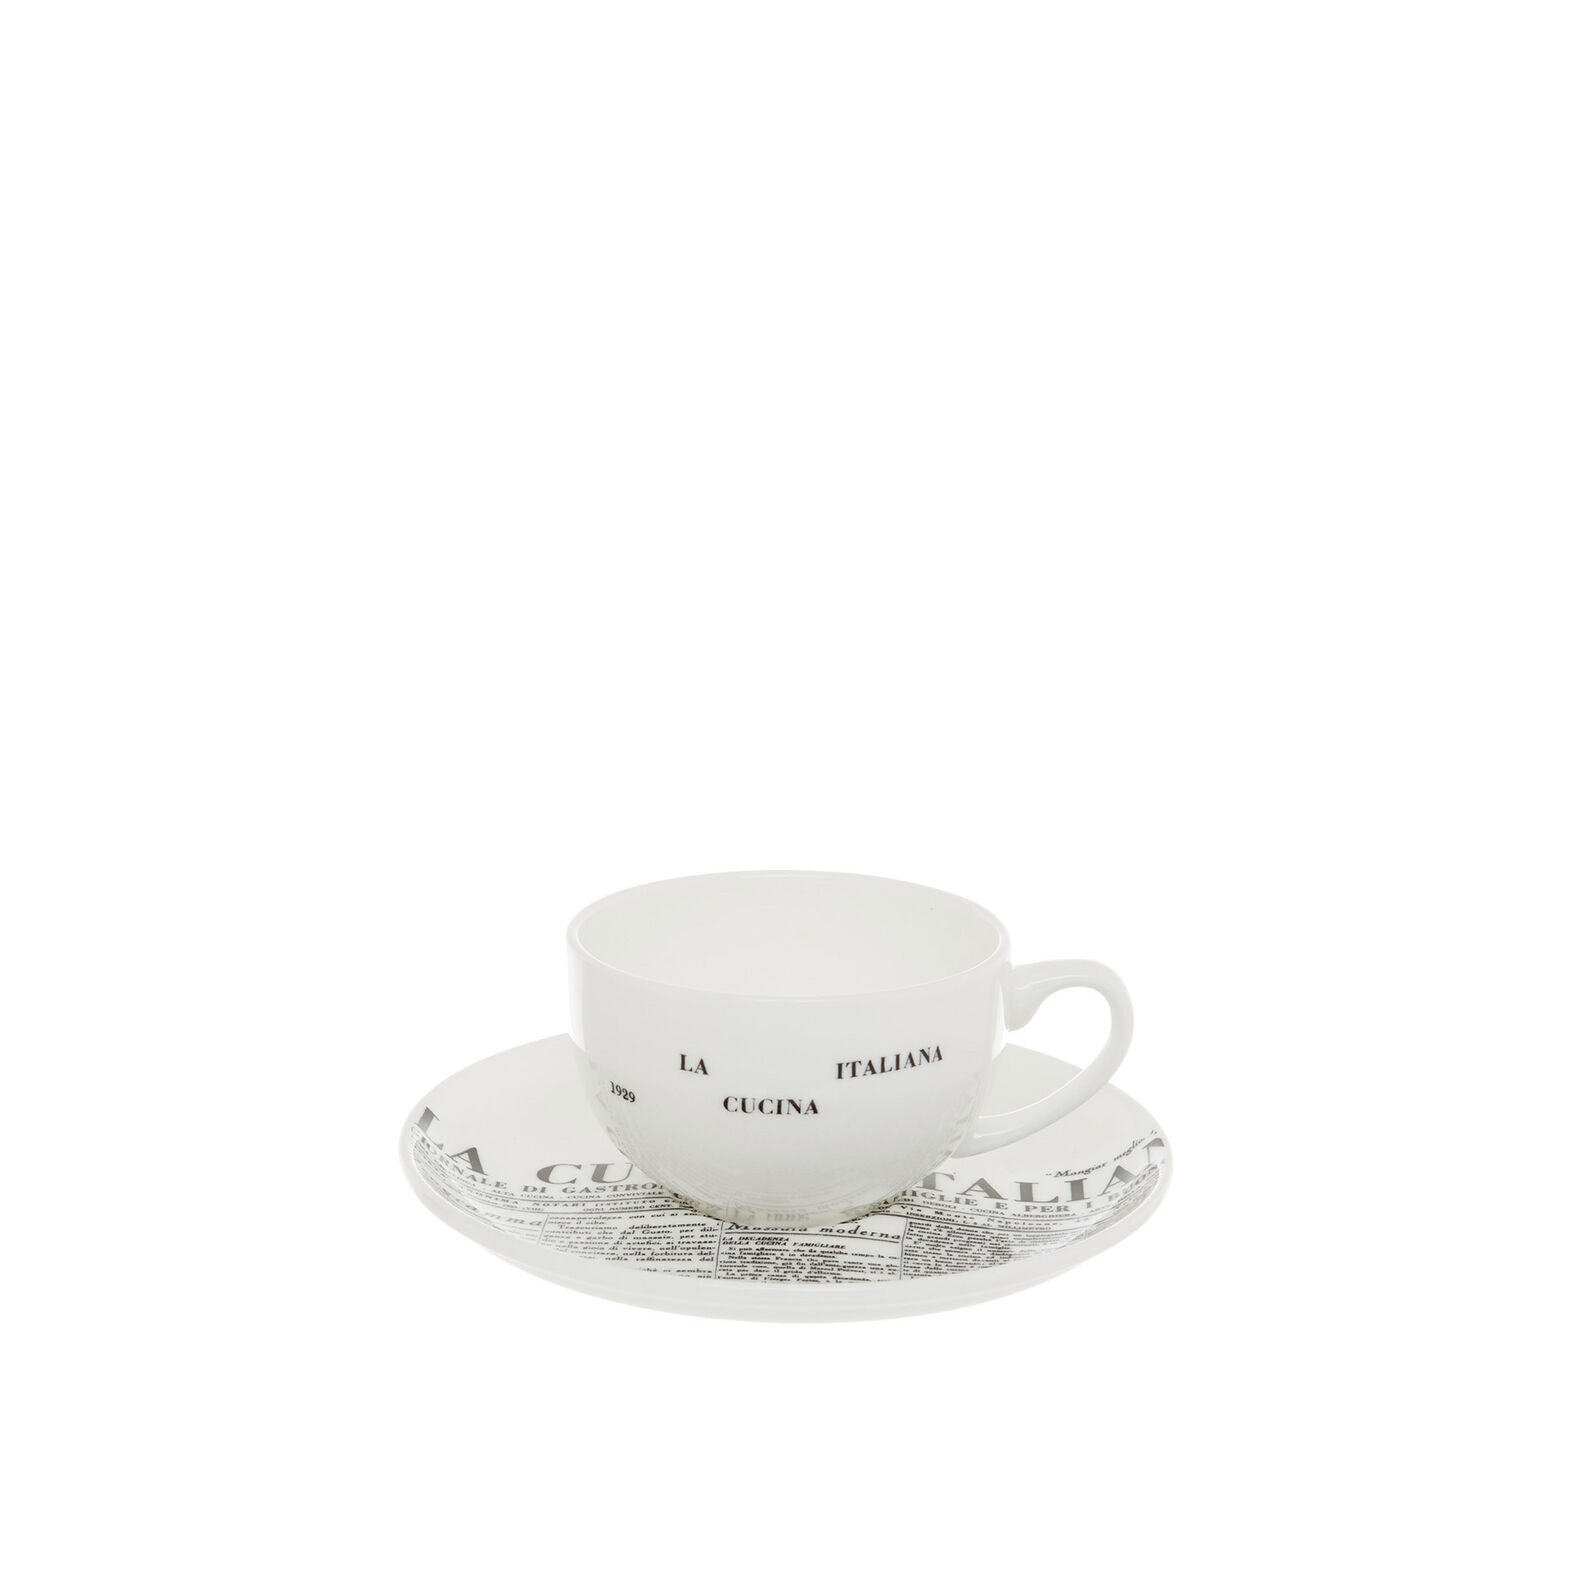 Fine bone china coffee cup with geometric La Cucina Italiana decoration